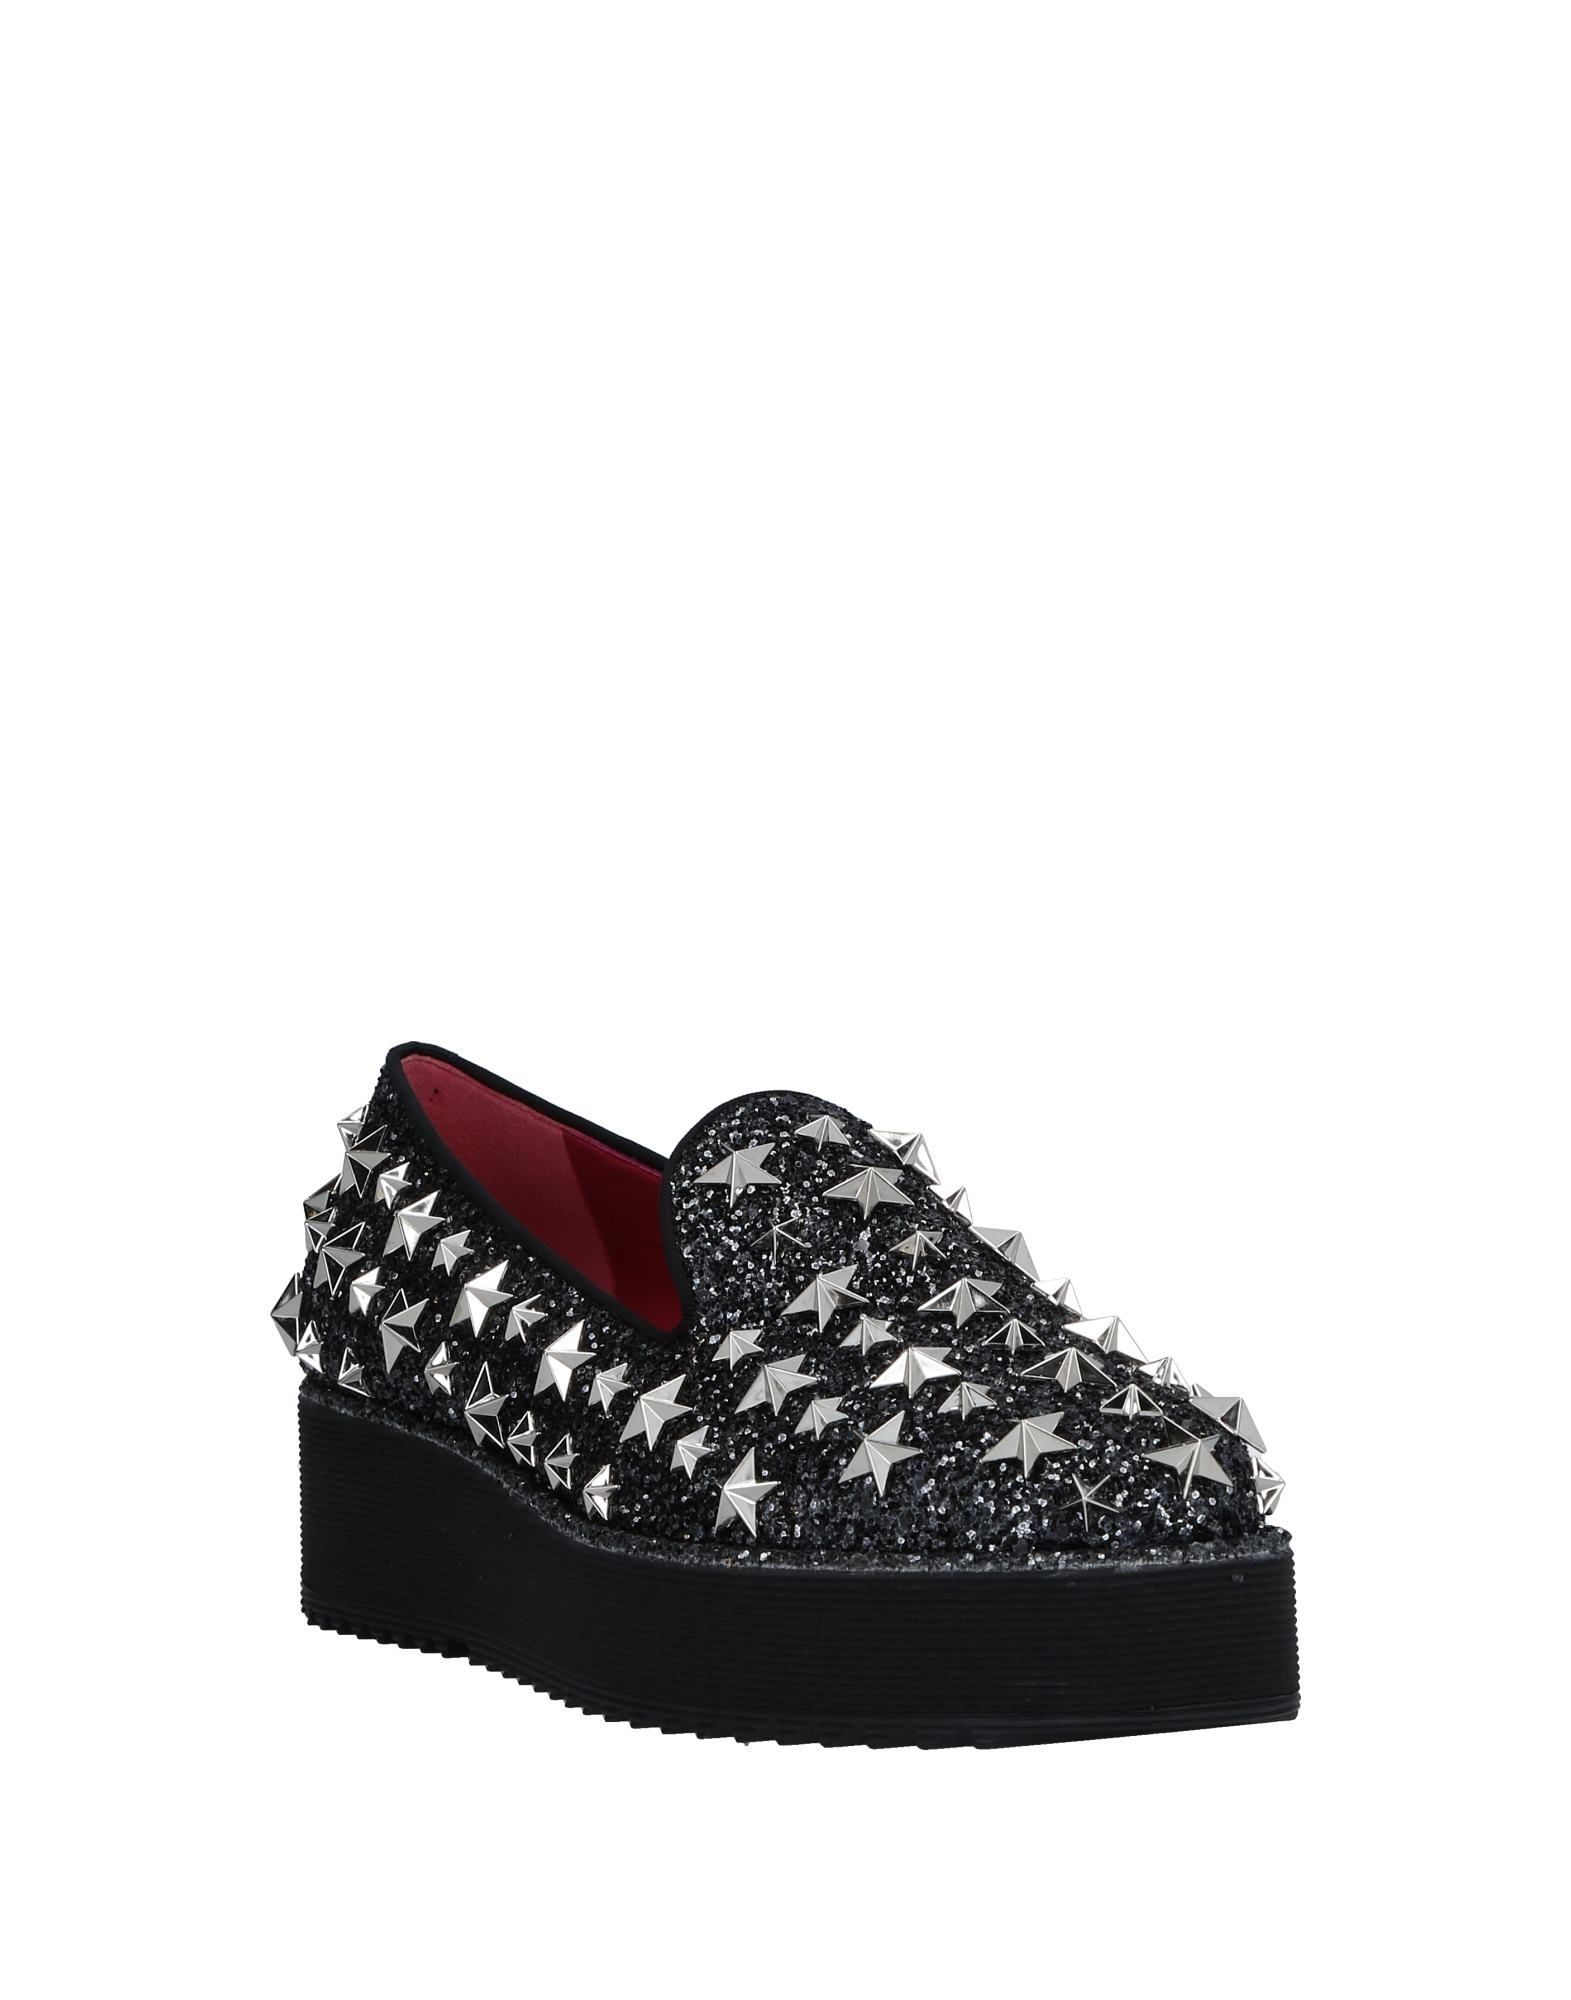 Stilvolle billige Schuhe 181  By Alberto Gozzi Mokassins Damen  181 11535177UP c7db8d